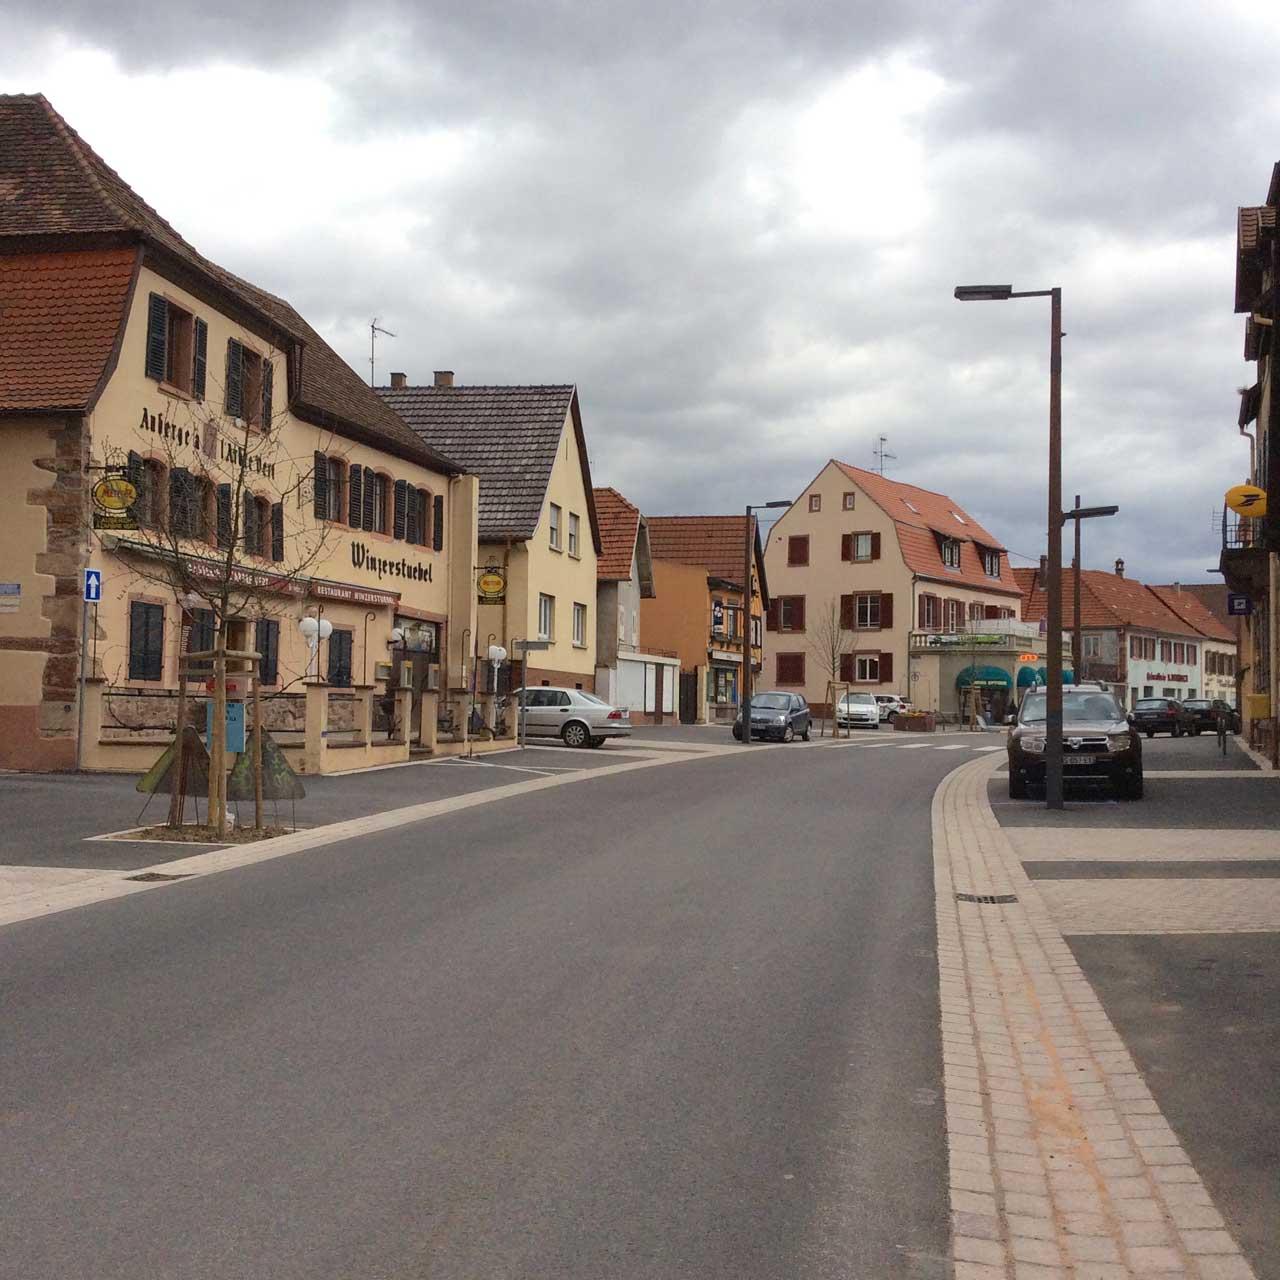 Le village Marlenheim